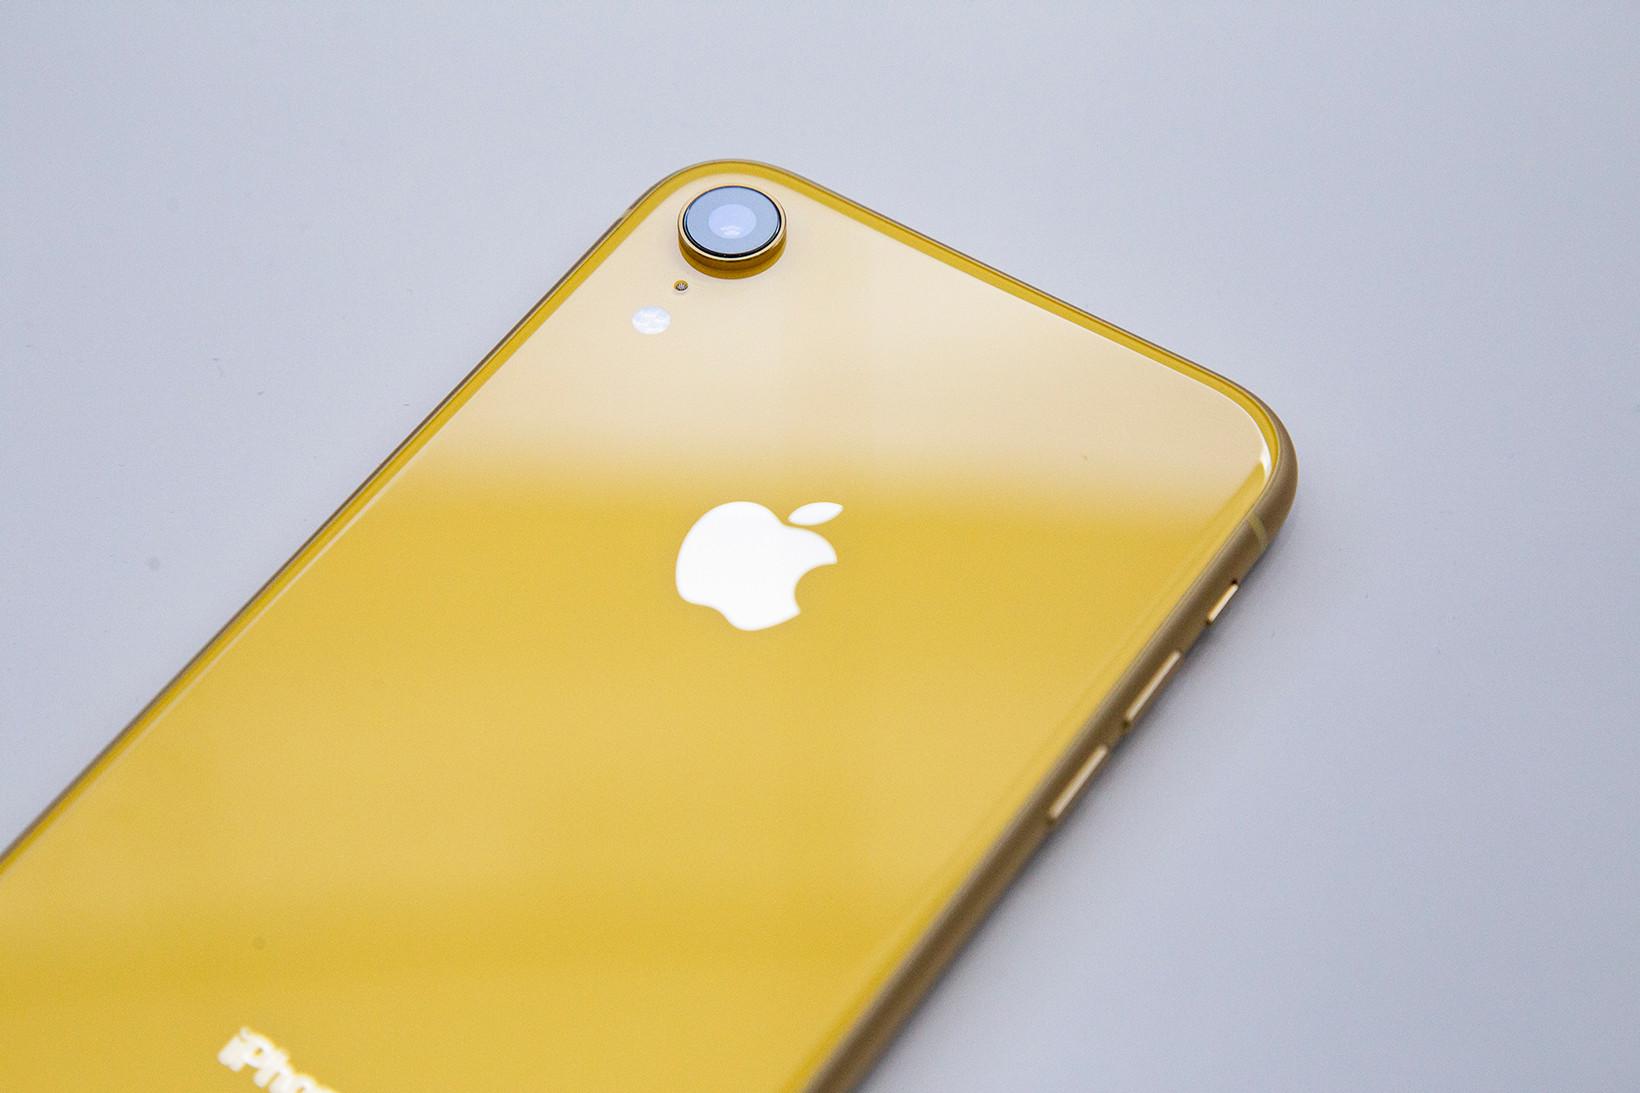 Ремонт iPhone XR - фото 5 | Сервисный центр Total Apple